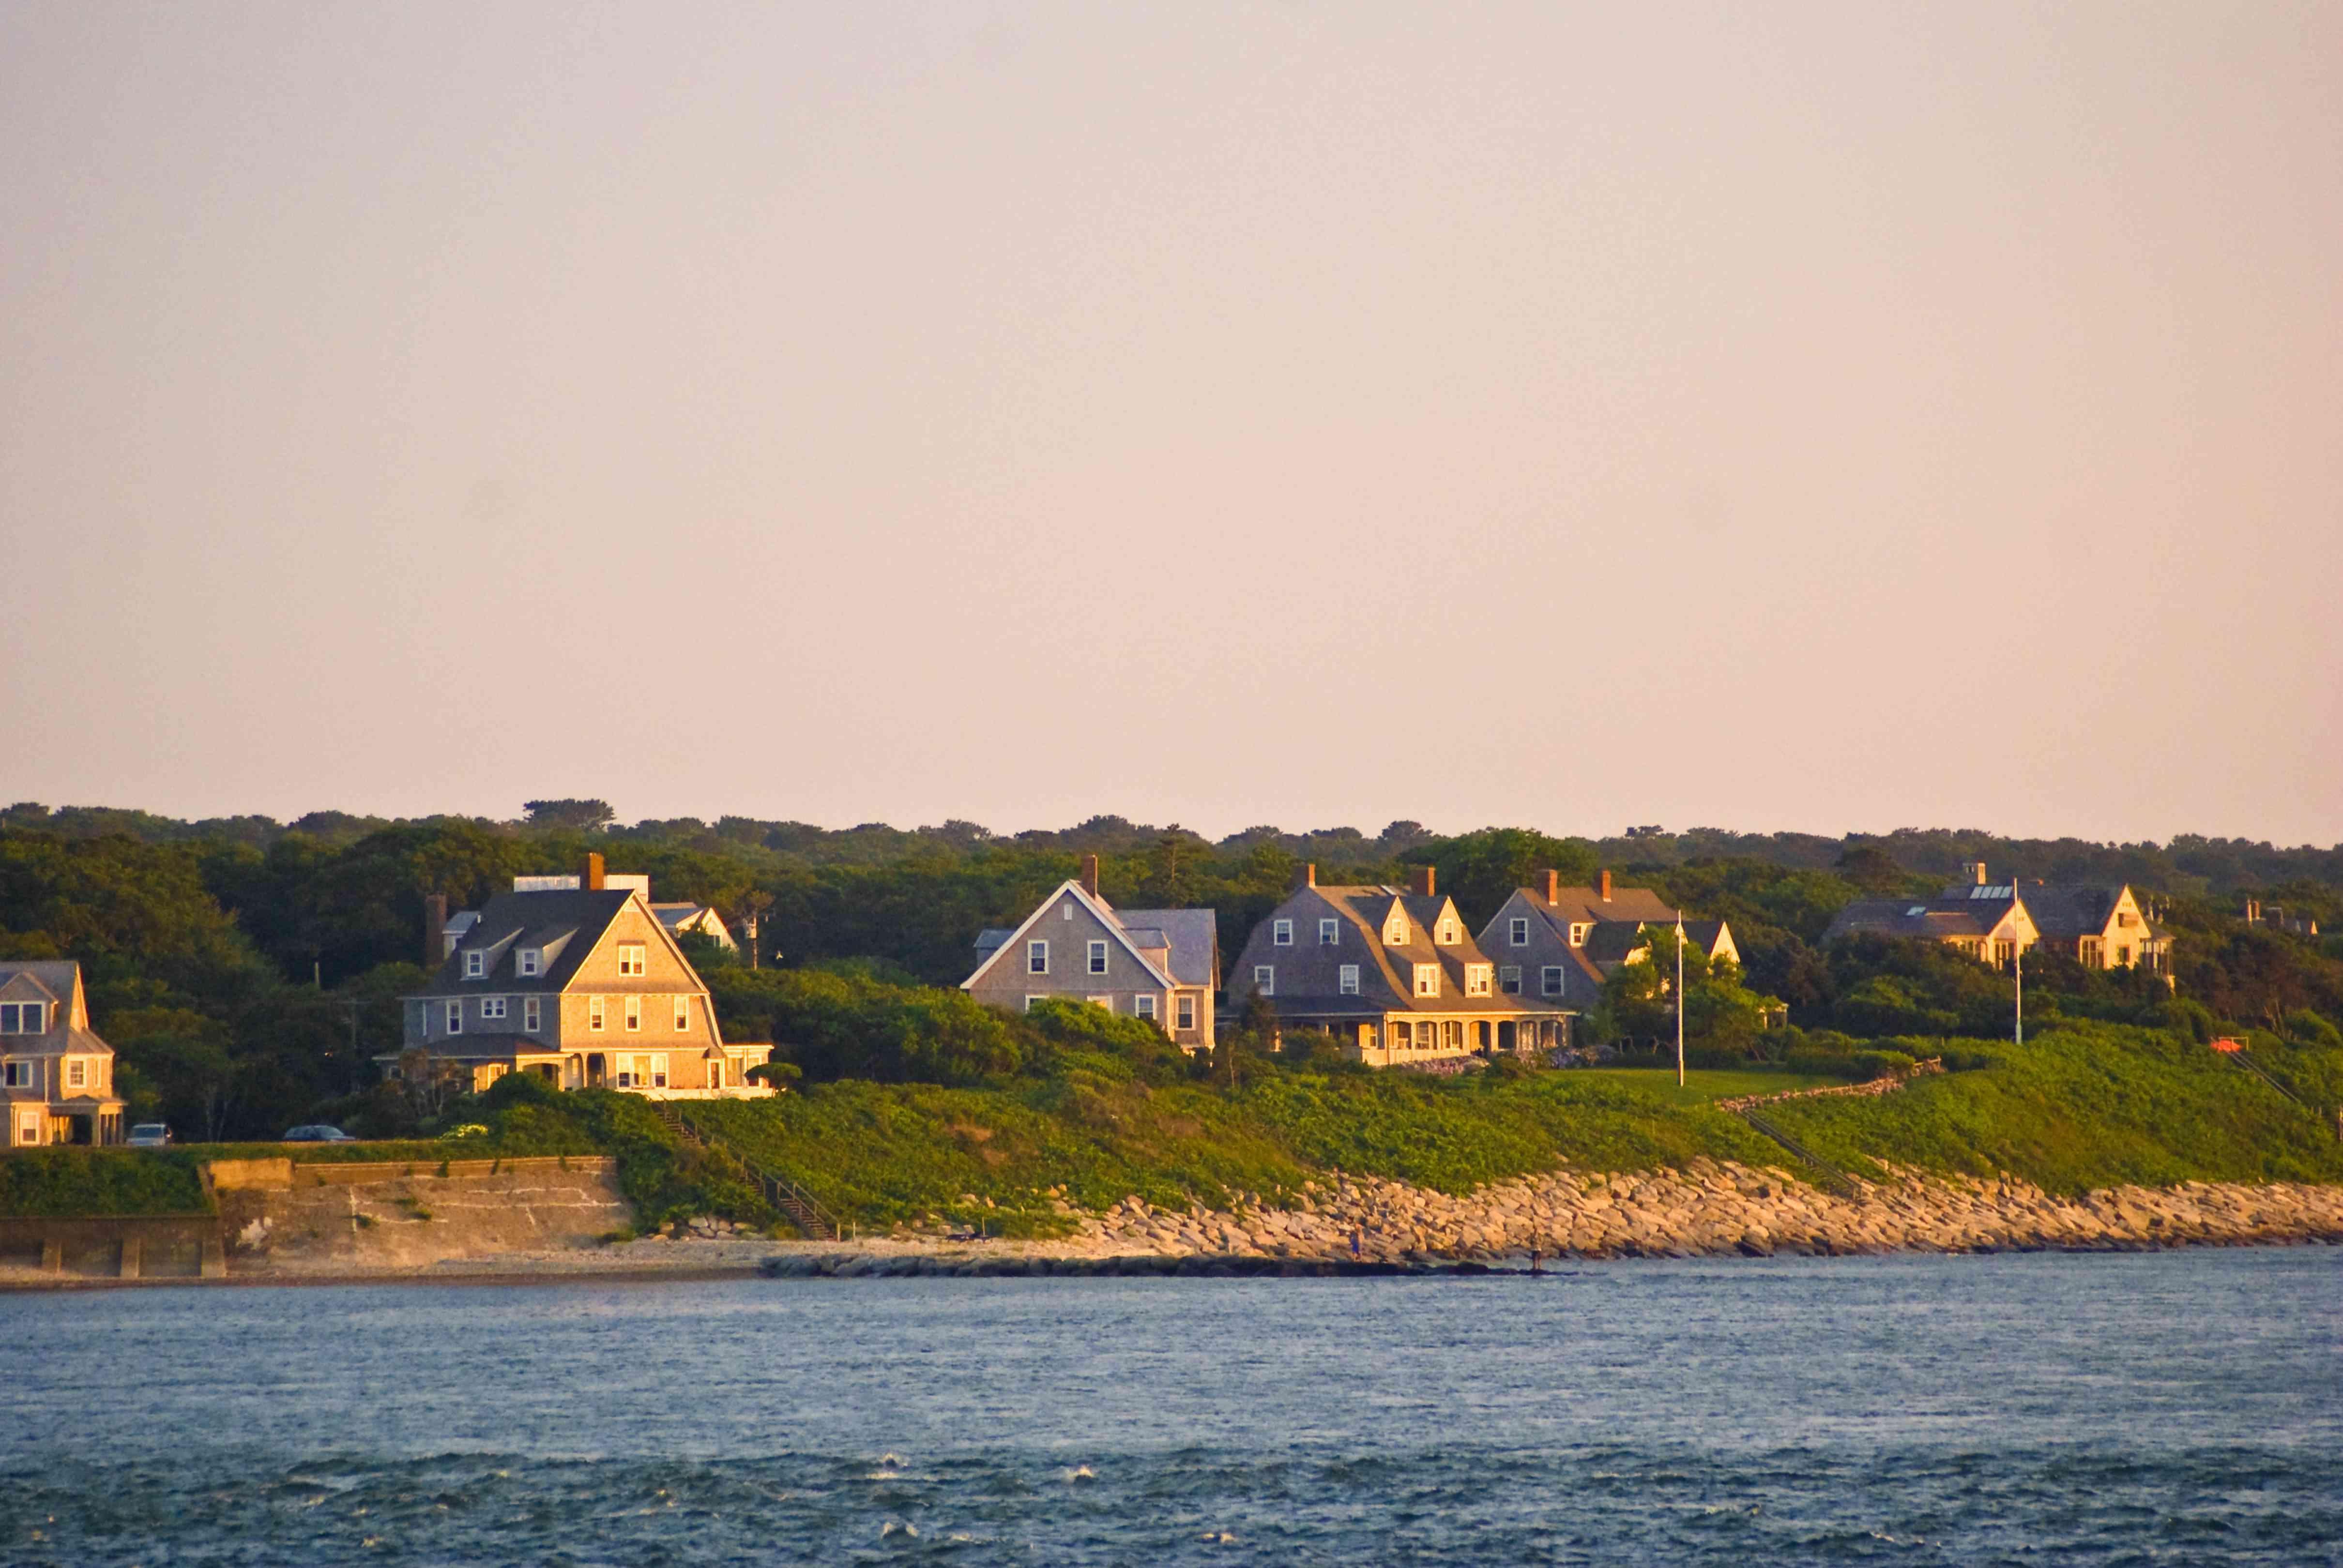 Houses along Cape Cod coast at sunset